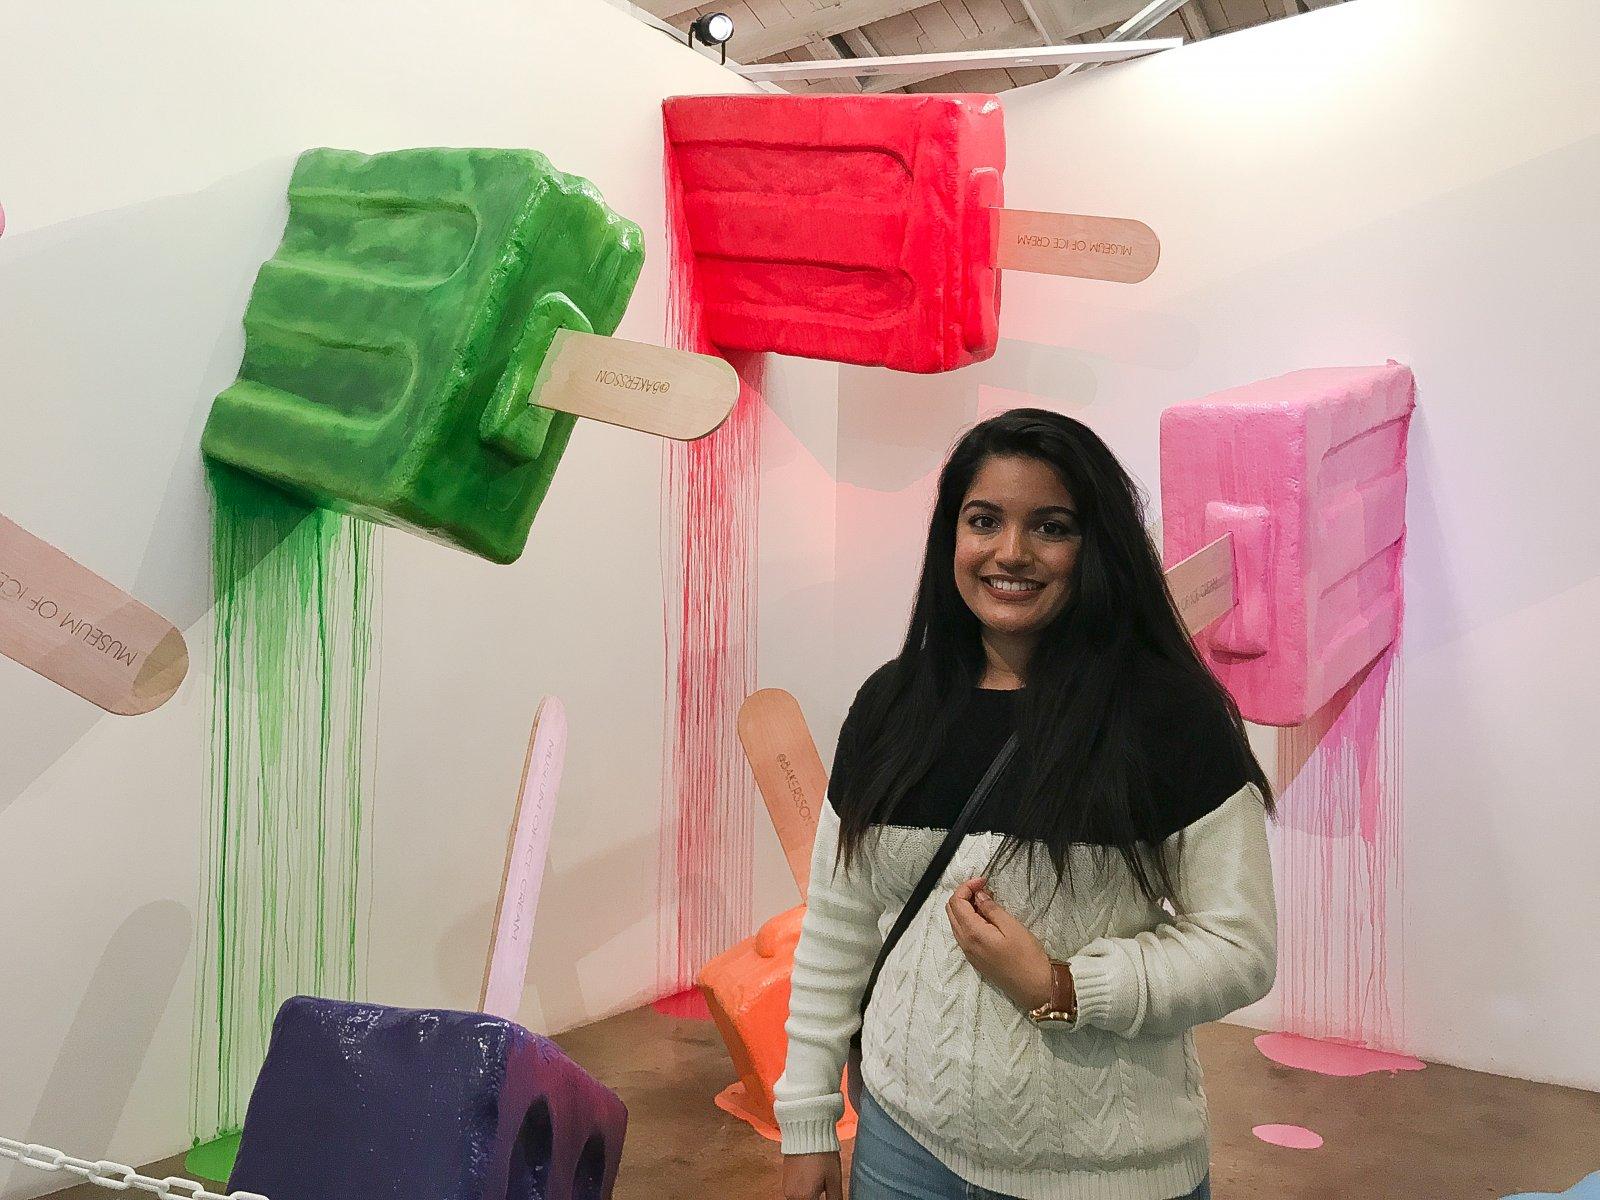 Museum of Ice Cream Giant Popsicles